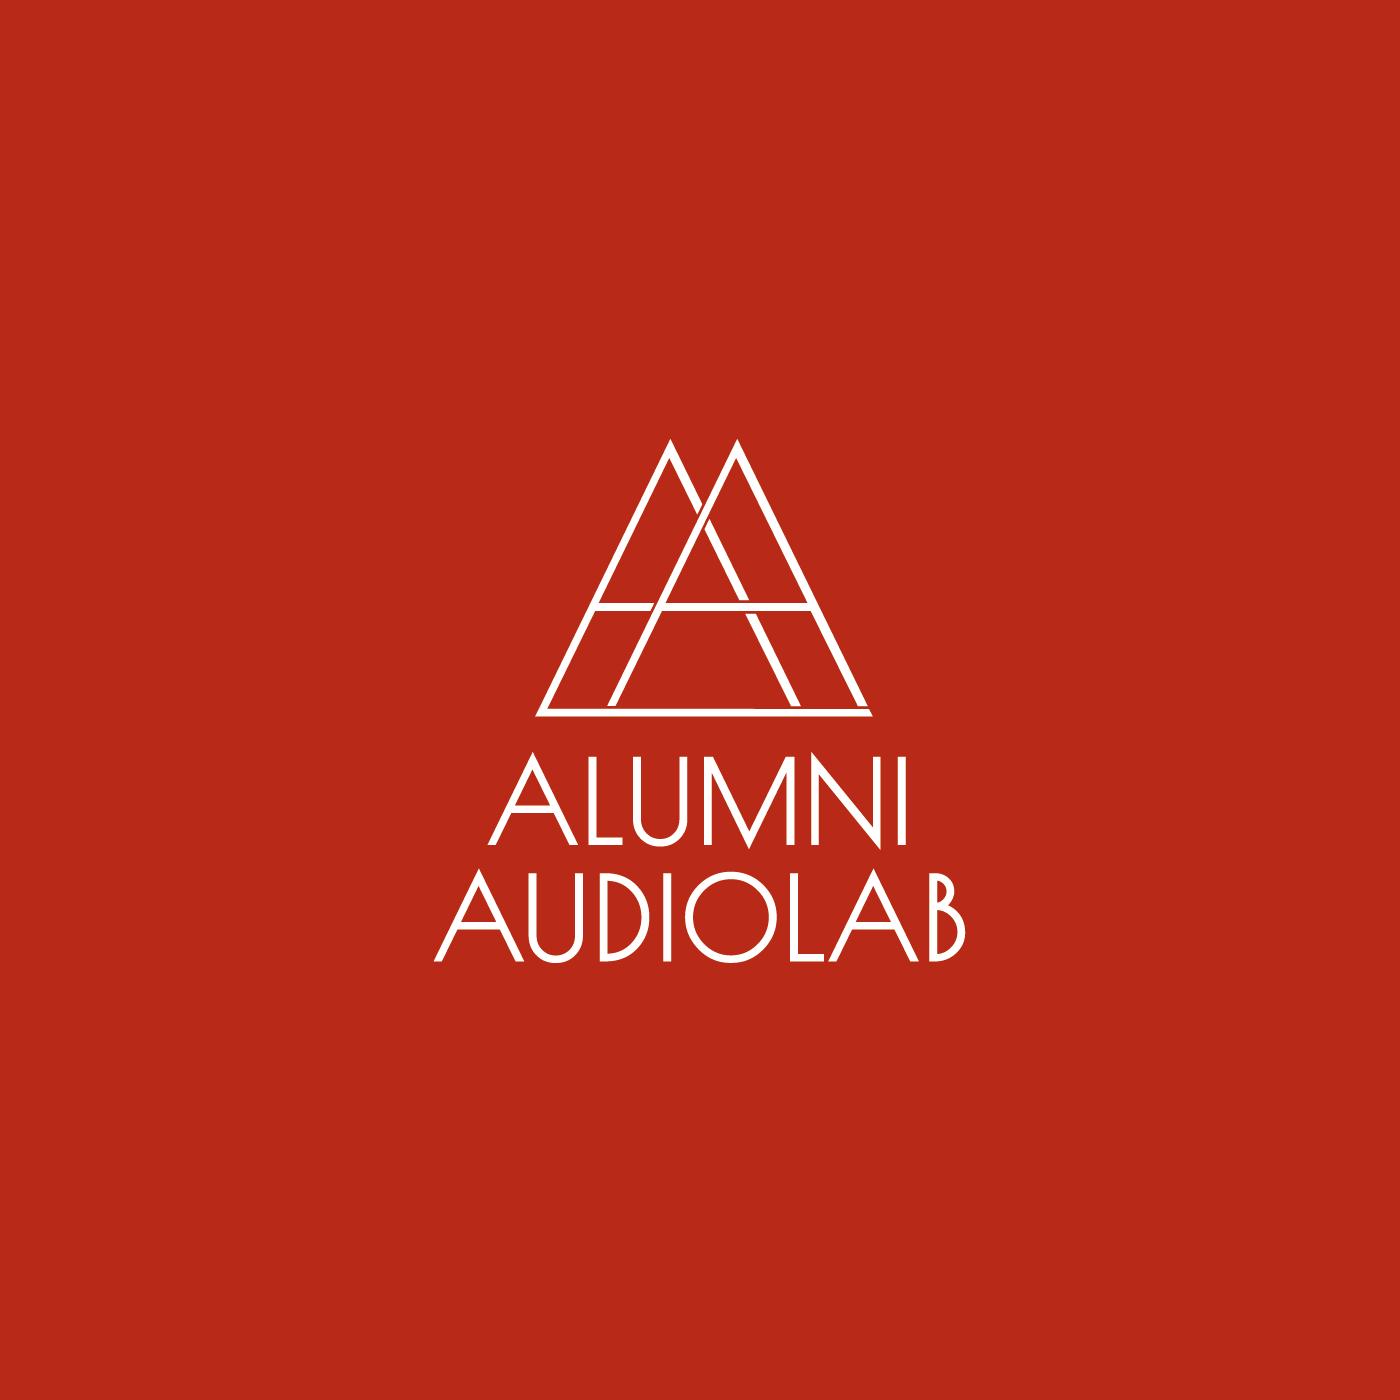 Podcast-Logo: Alumni AudioLab